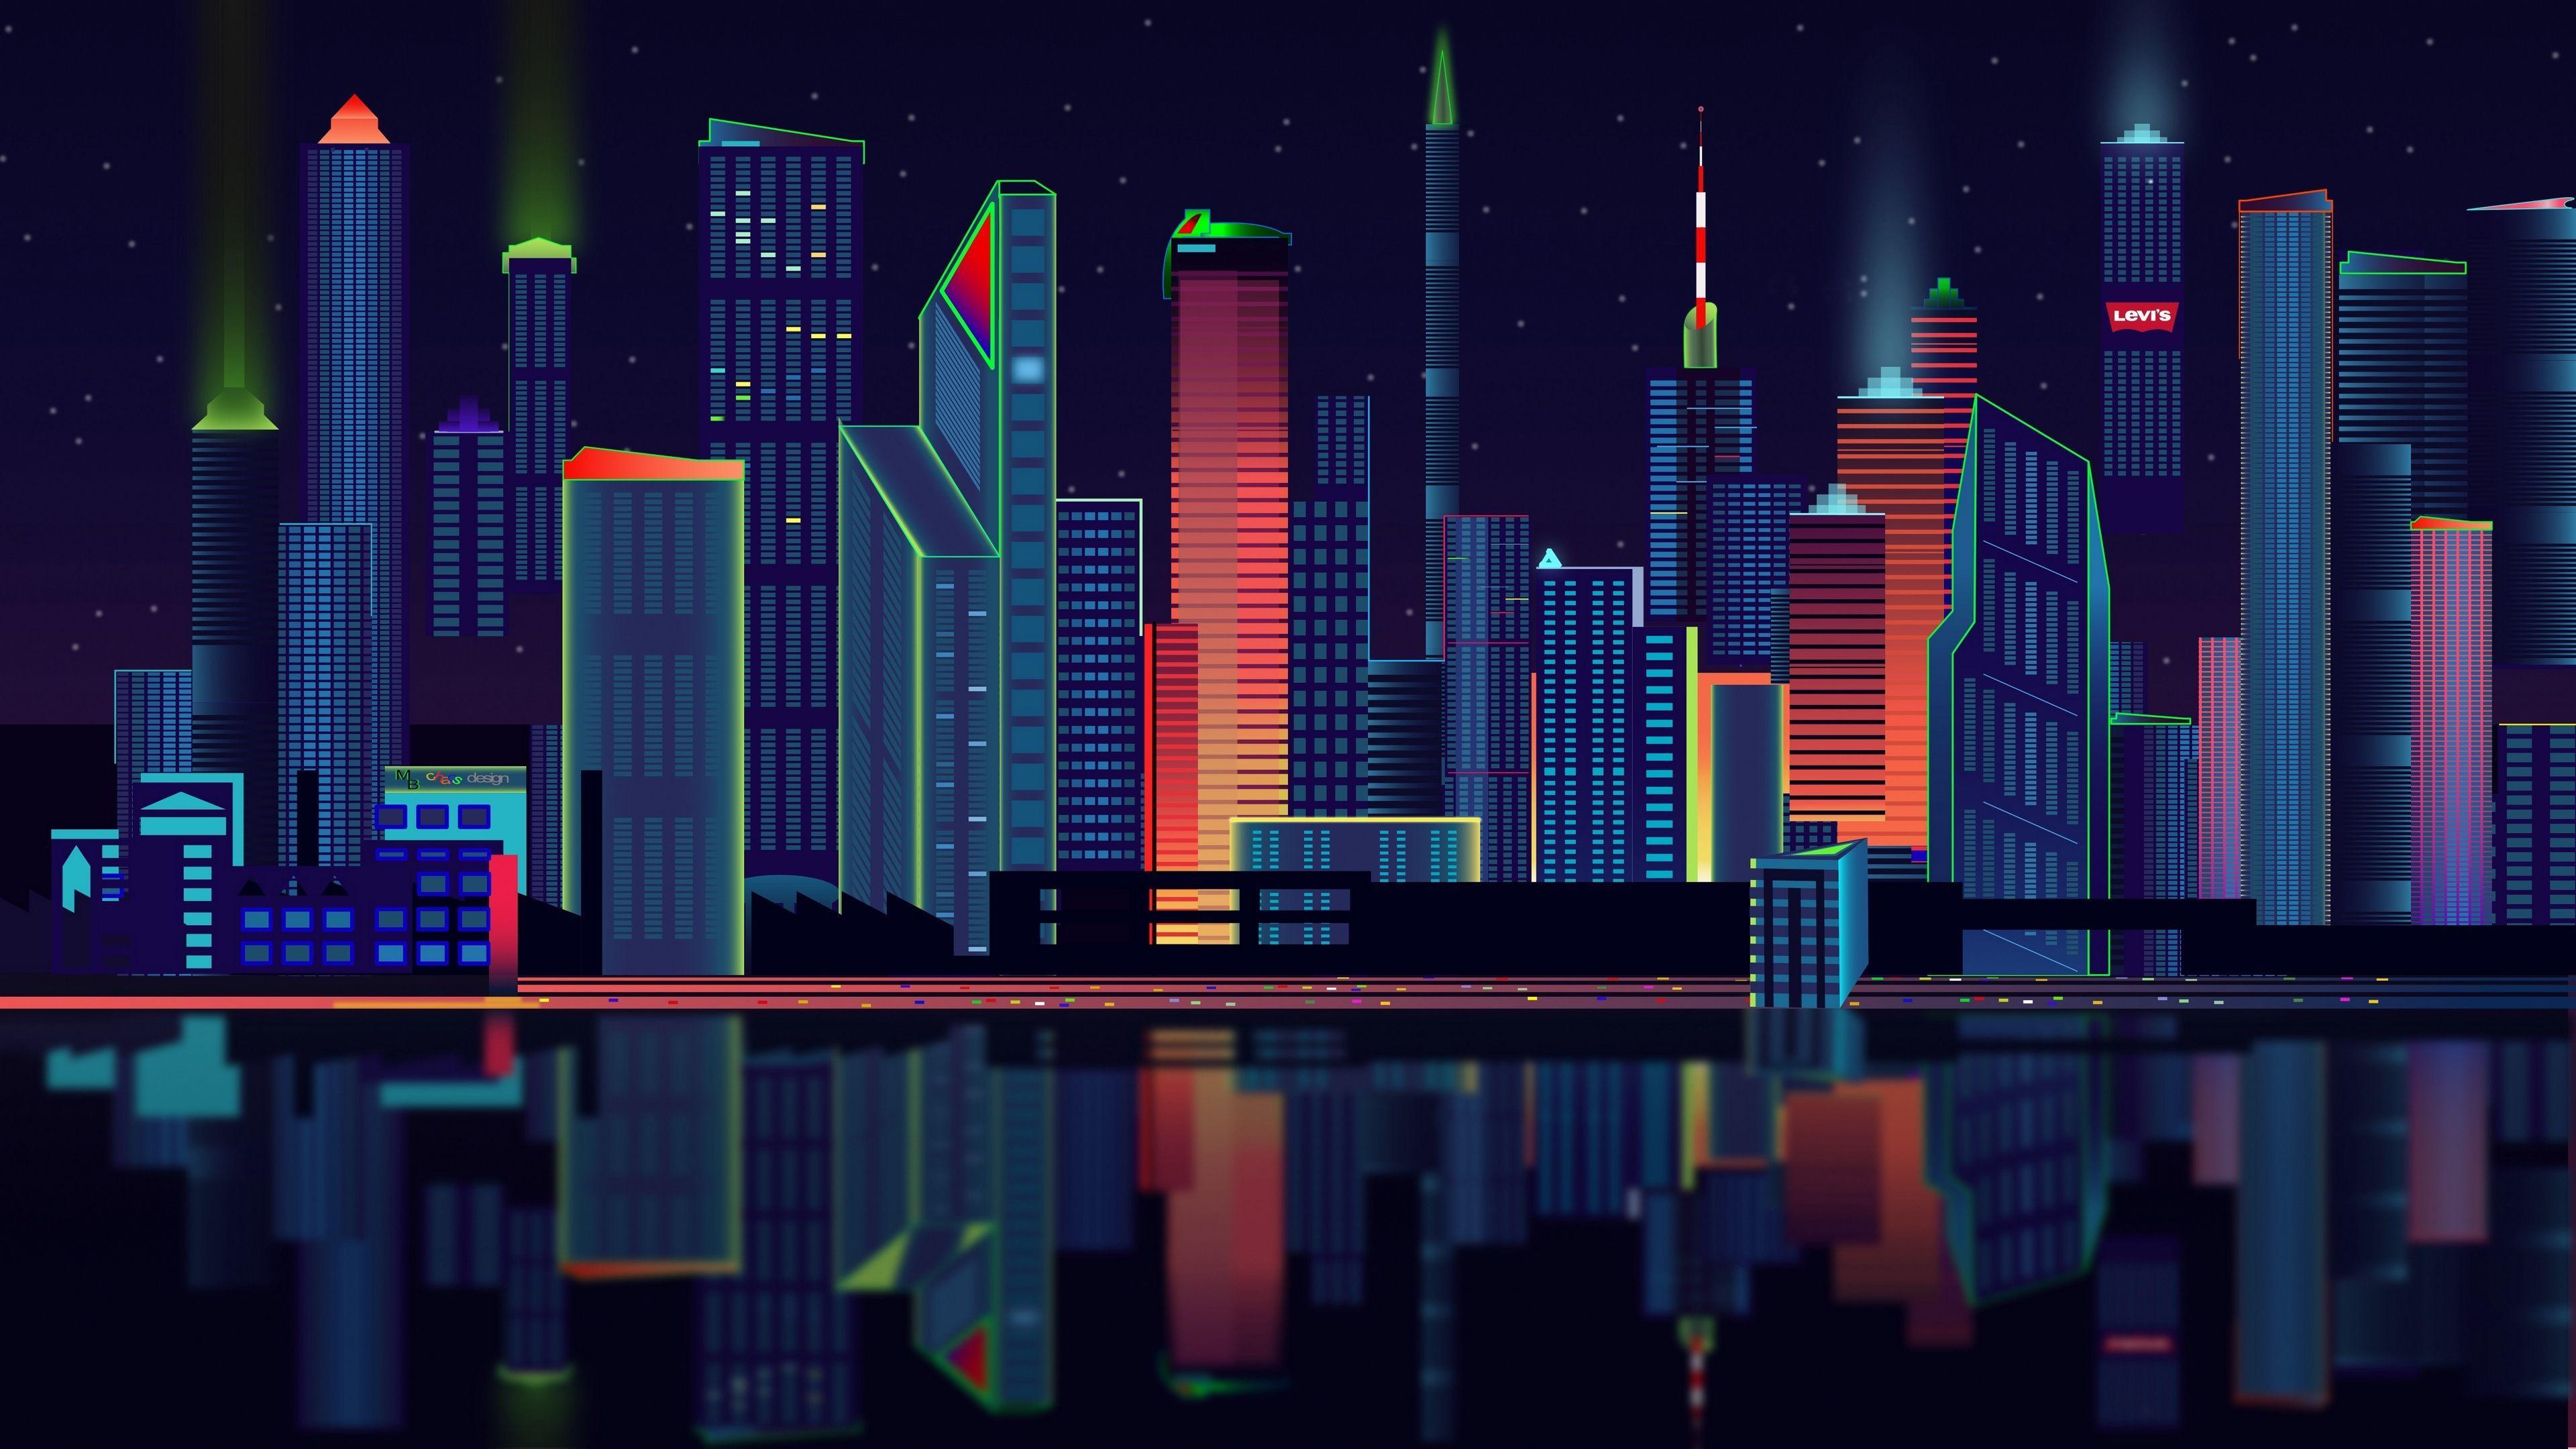 Panorama Wallpapers Top Free Panorama Backgrounds Wallpaperaccess